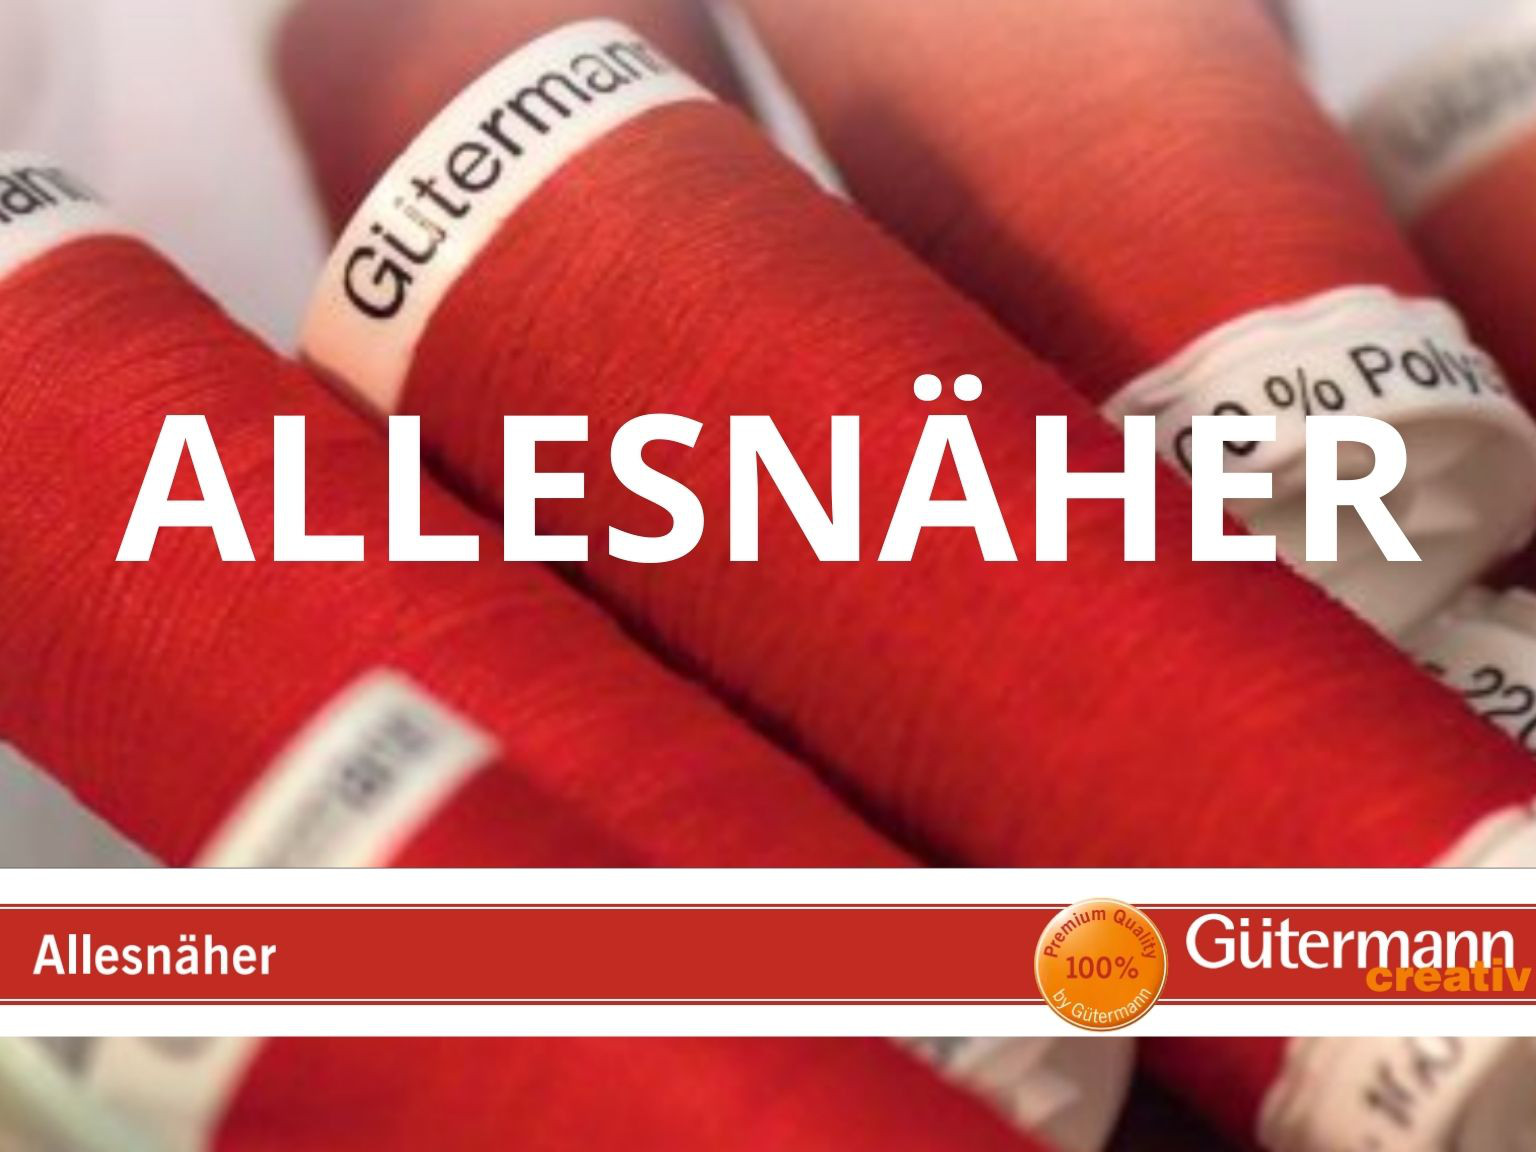 Nähgarn Allesnäher Gütermann 200m